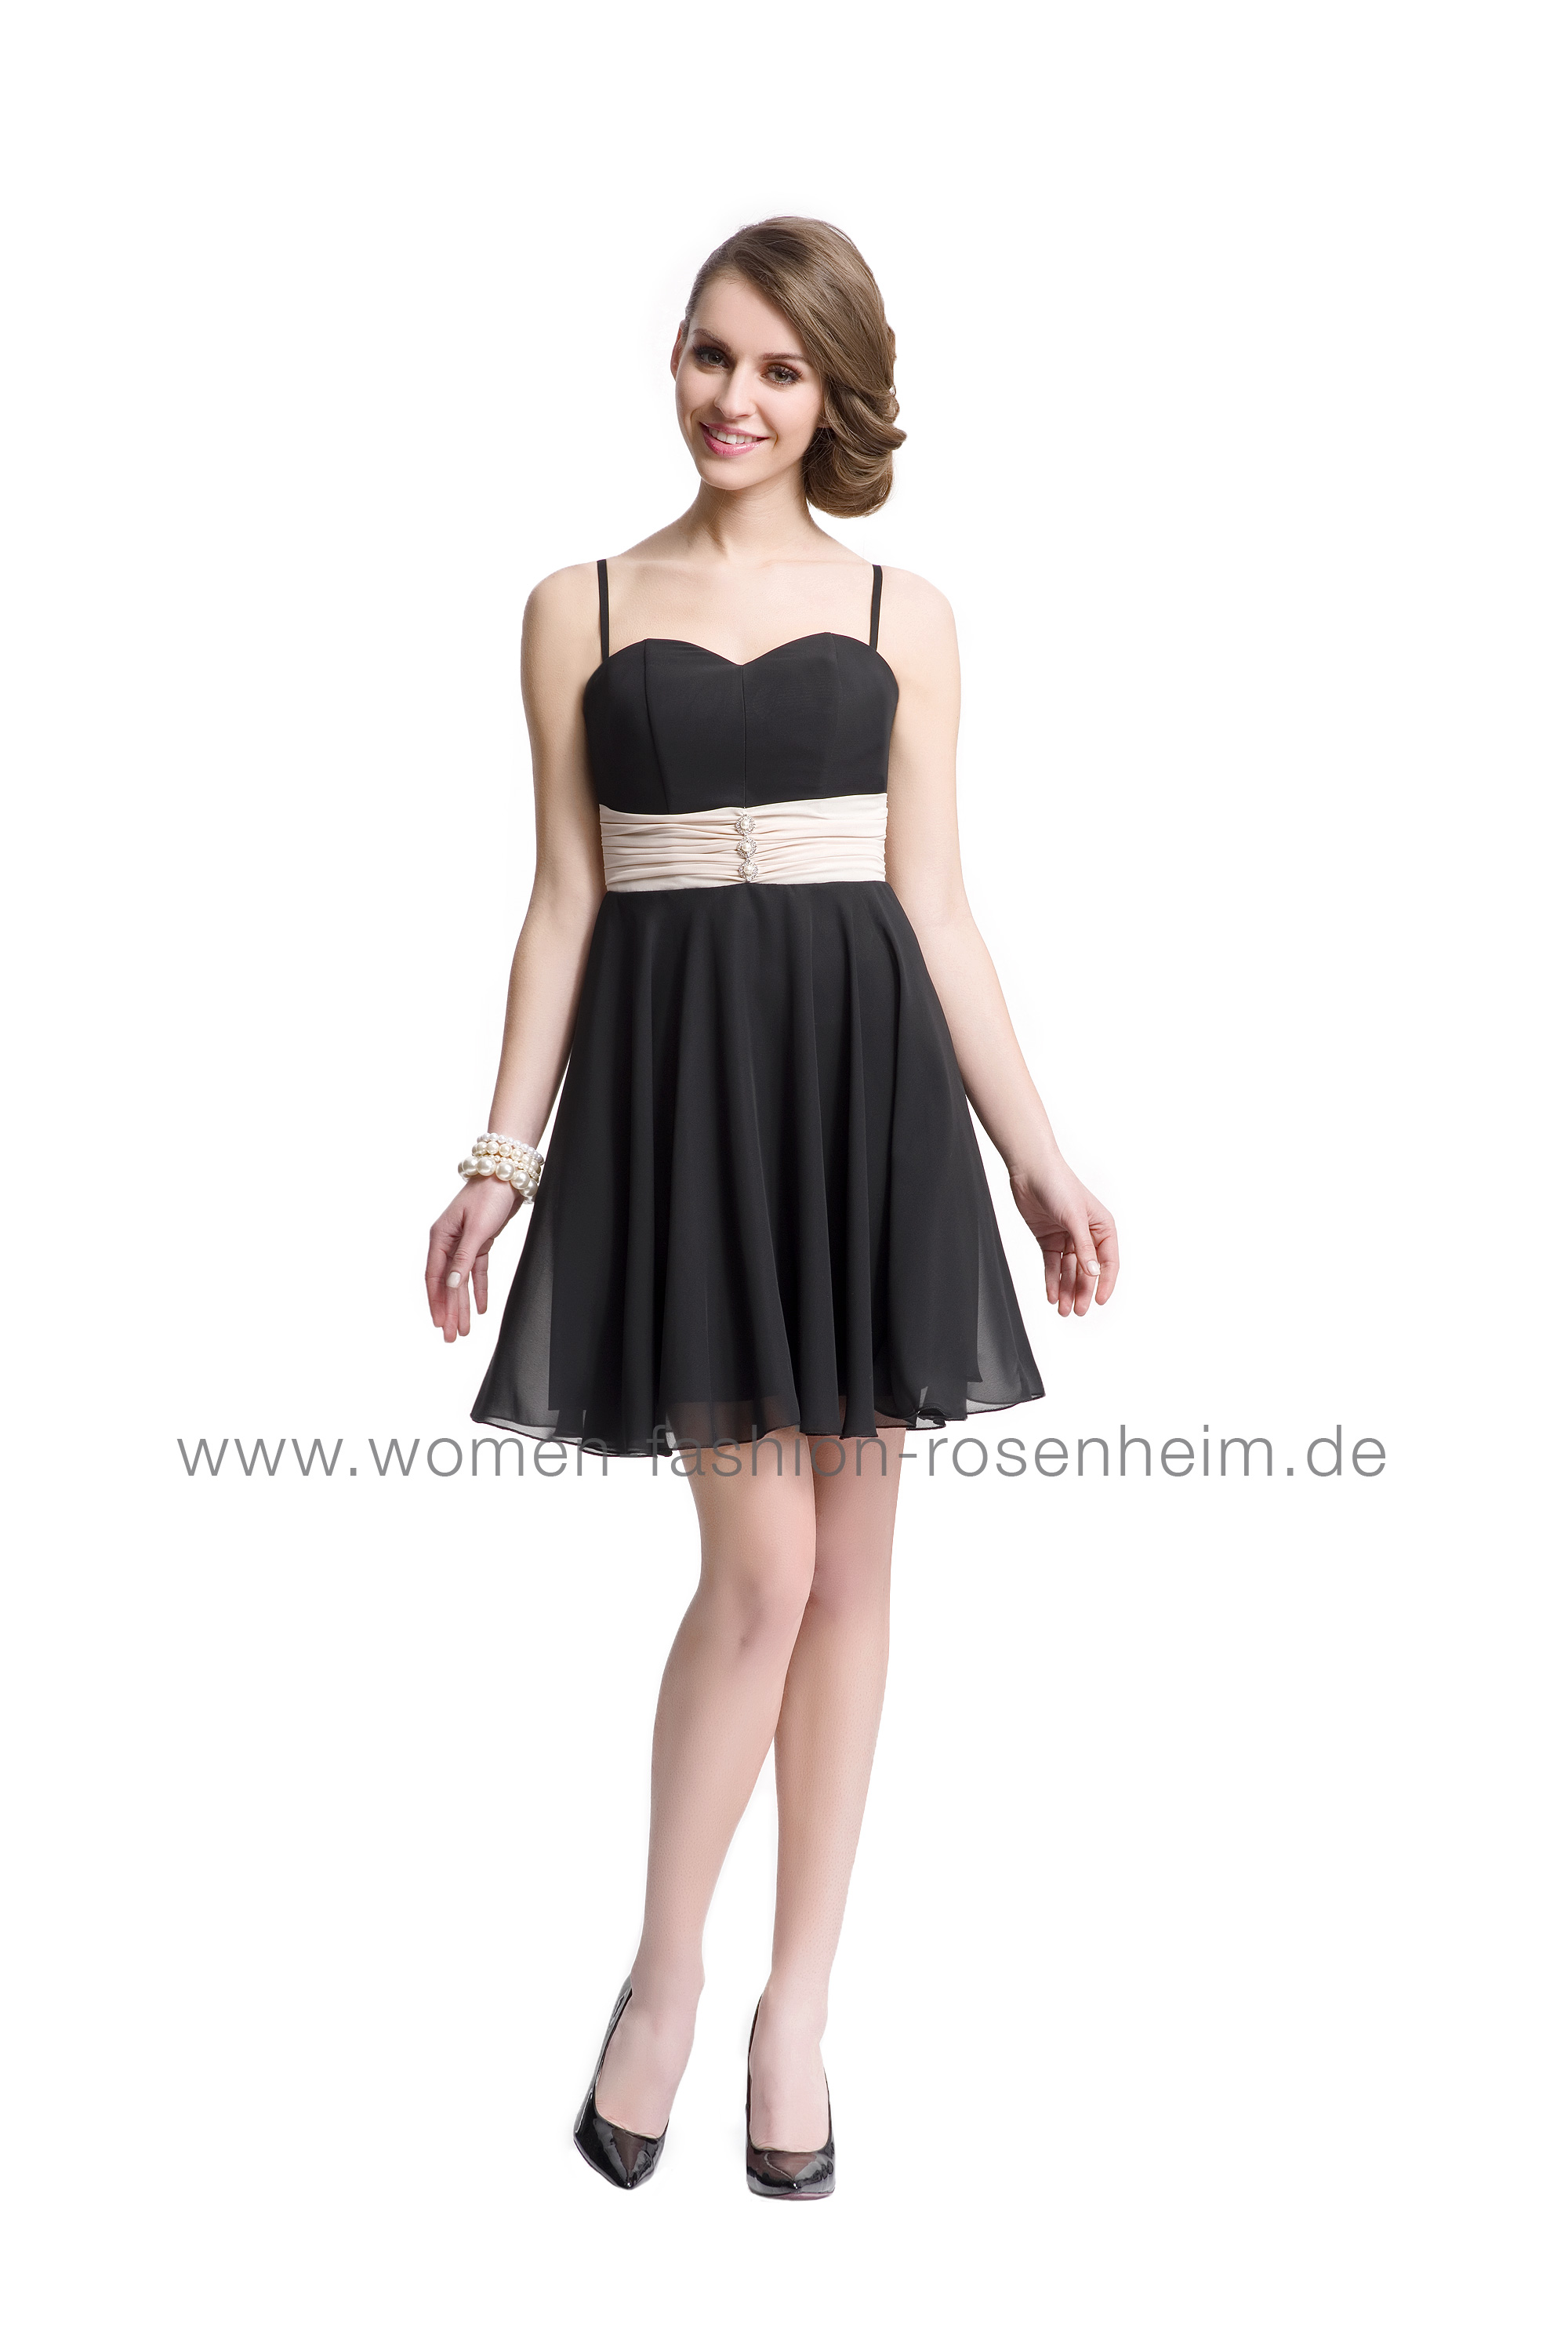 Women Fashion Com